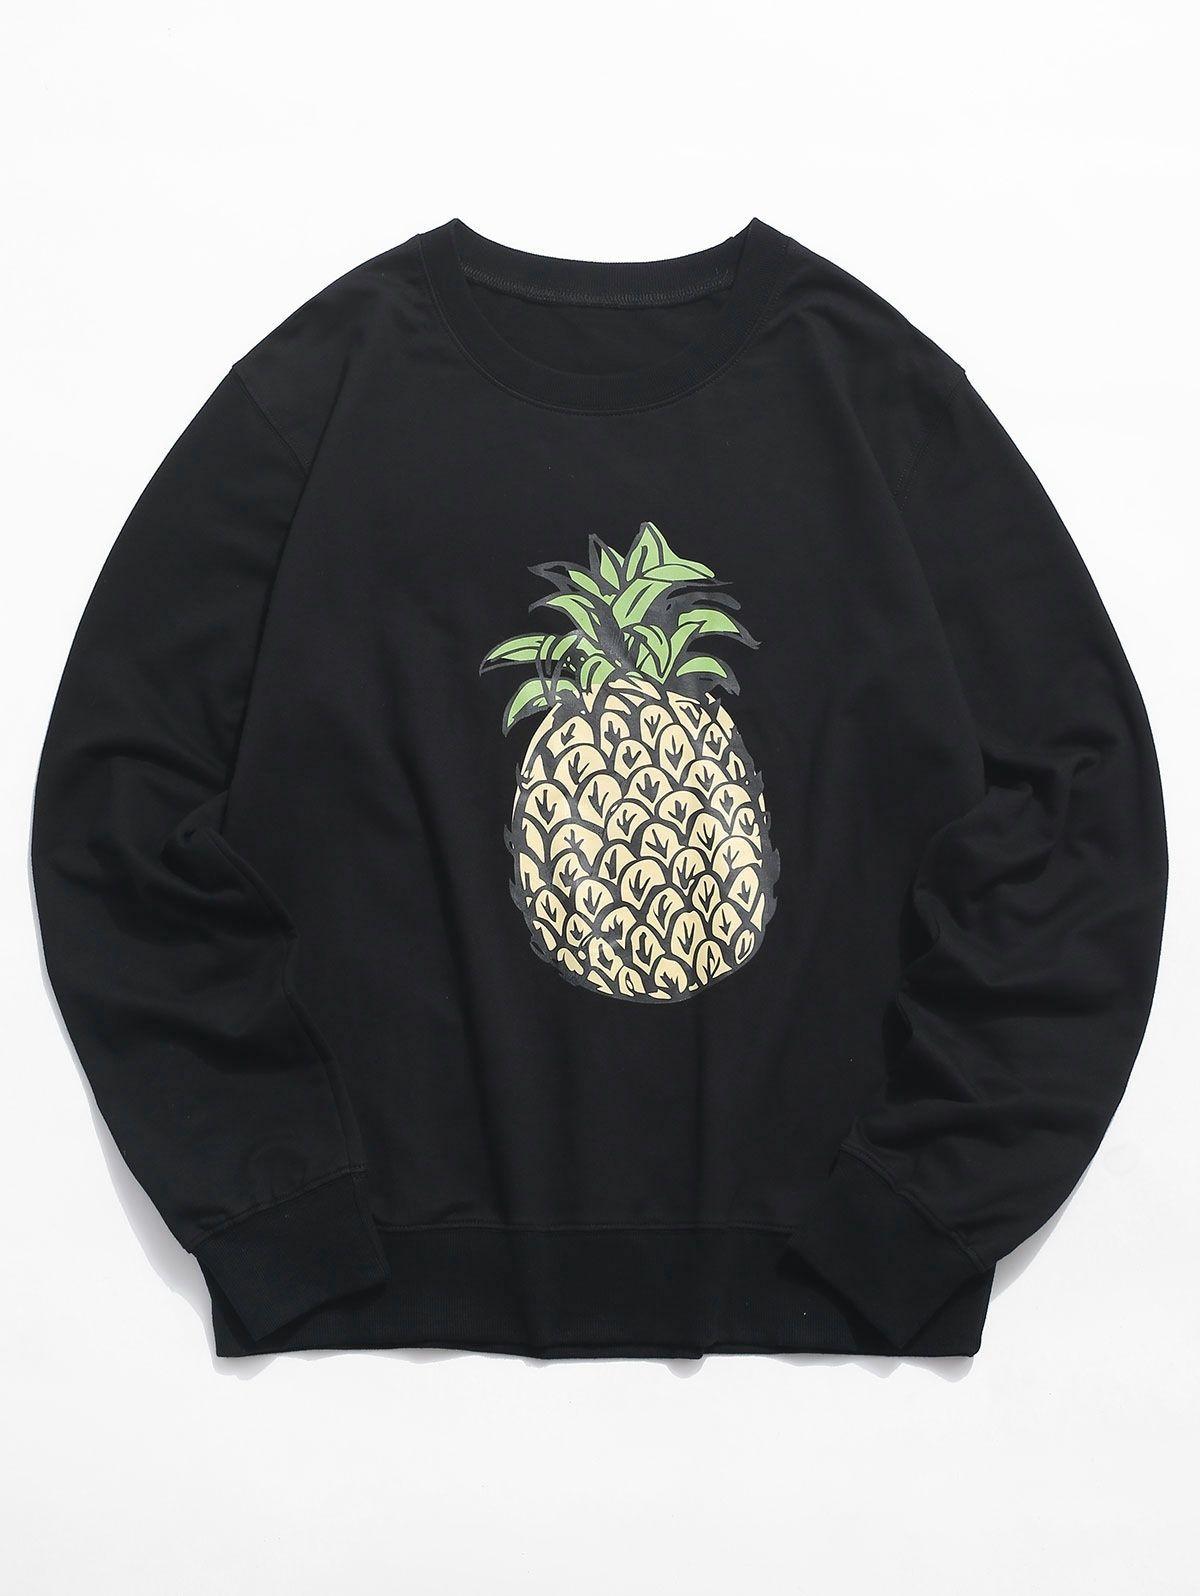 Pineapple Graphic Crew Neck Lounge Sweatshirt Black Ad Ad Crew Graphic Pineapple Neck Black In 2020 Sweatshirts Sweatshirt Fashion Black Sweatshirts [ 1596 x 1200 Pixel ]